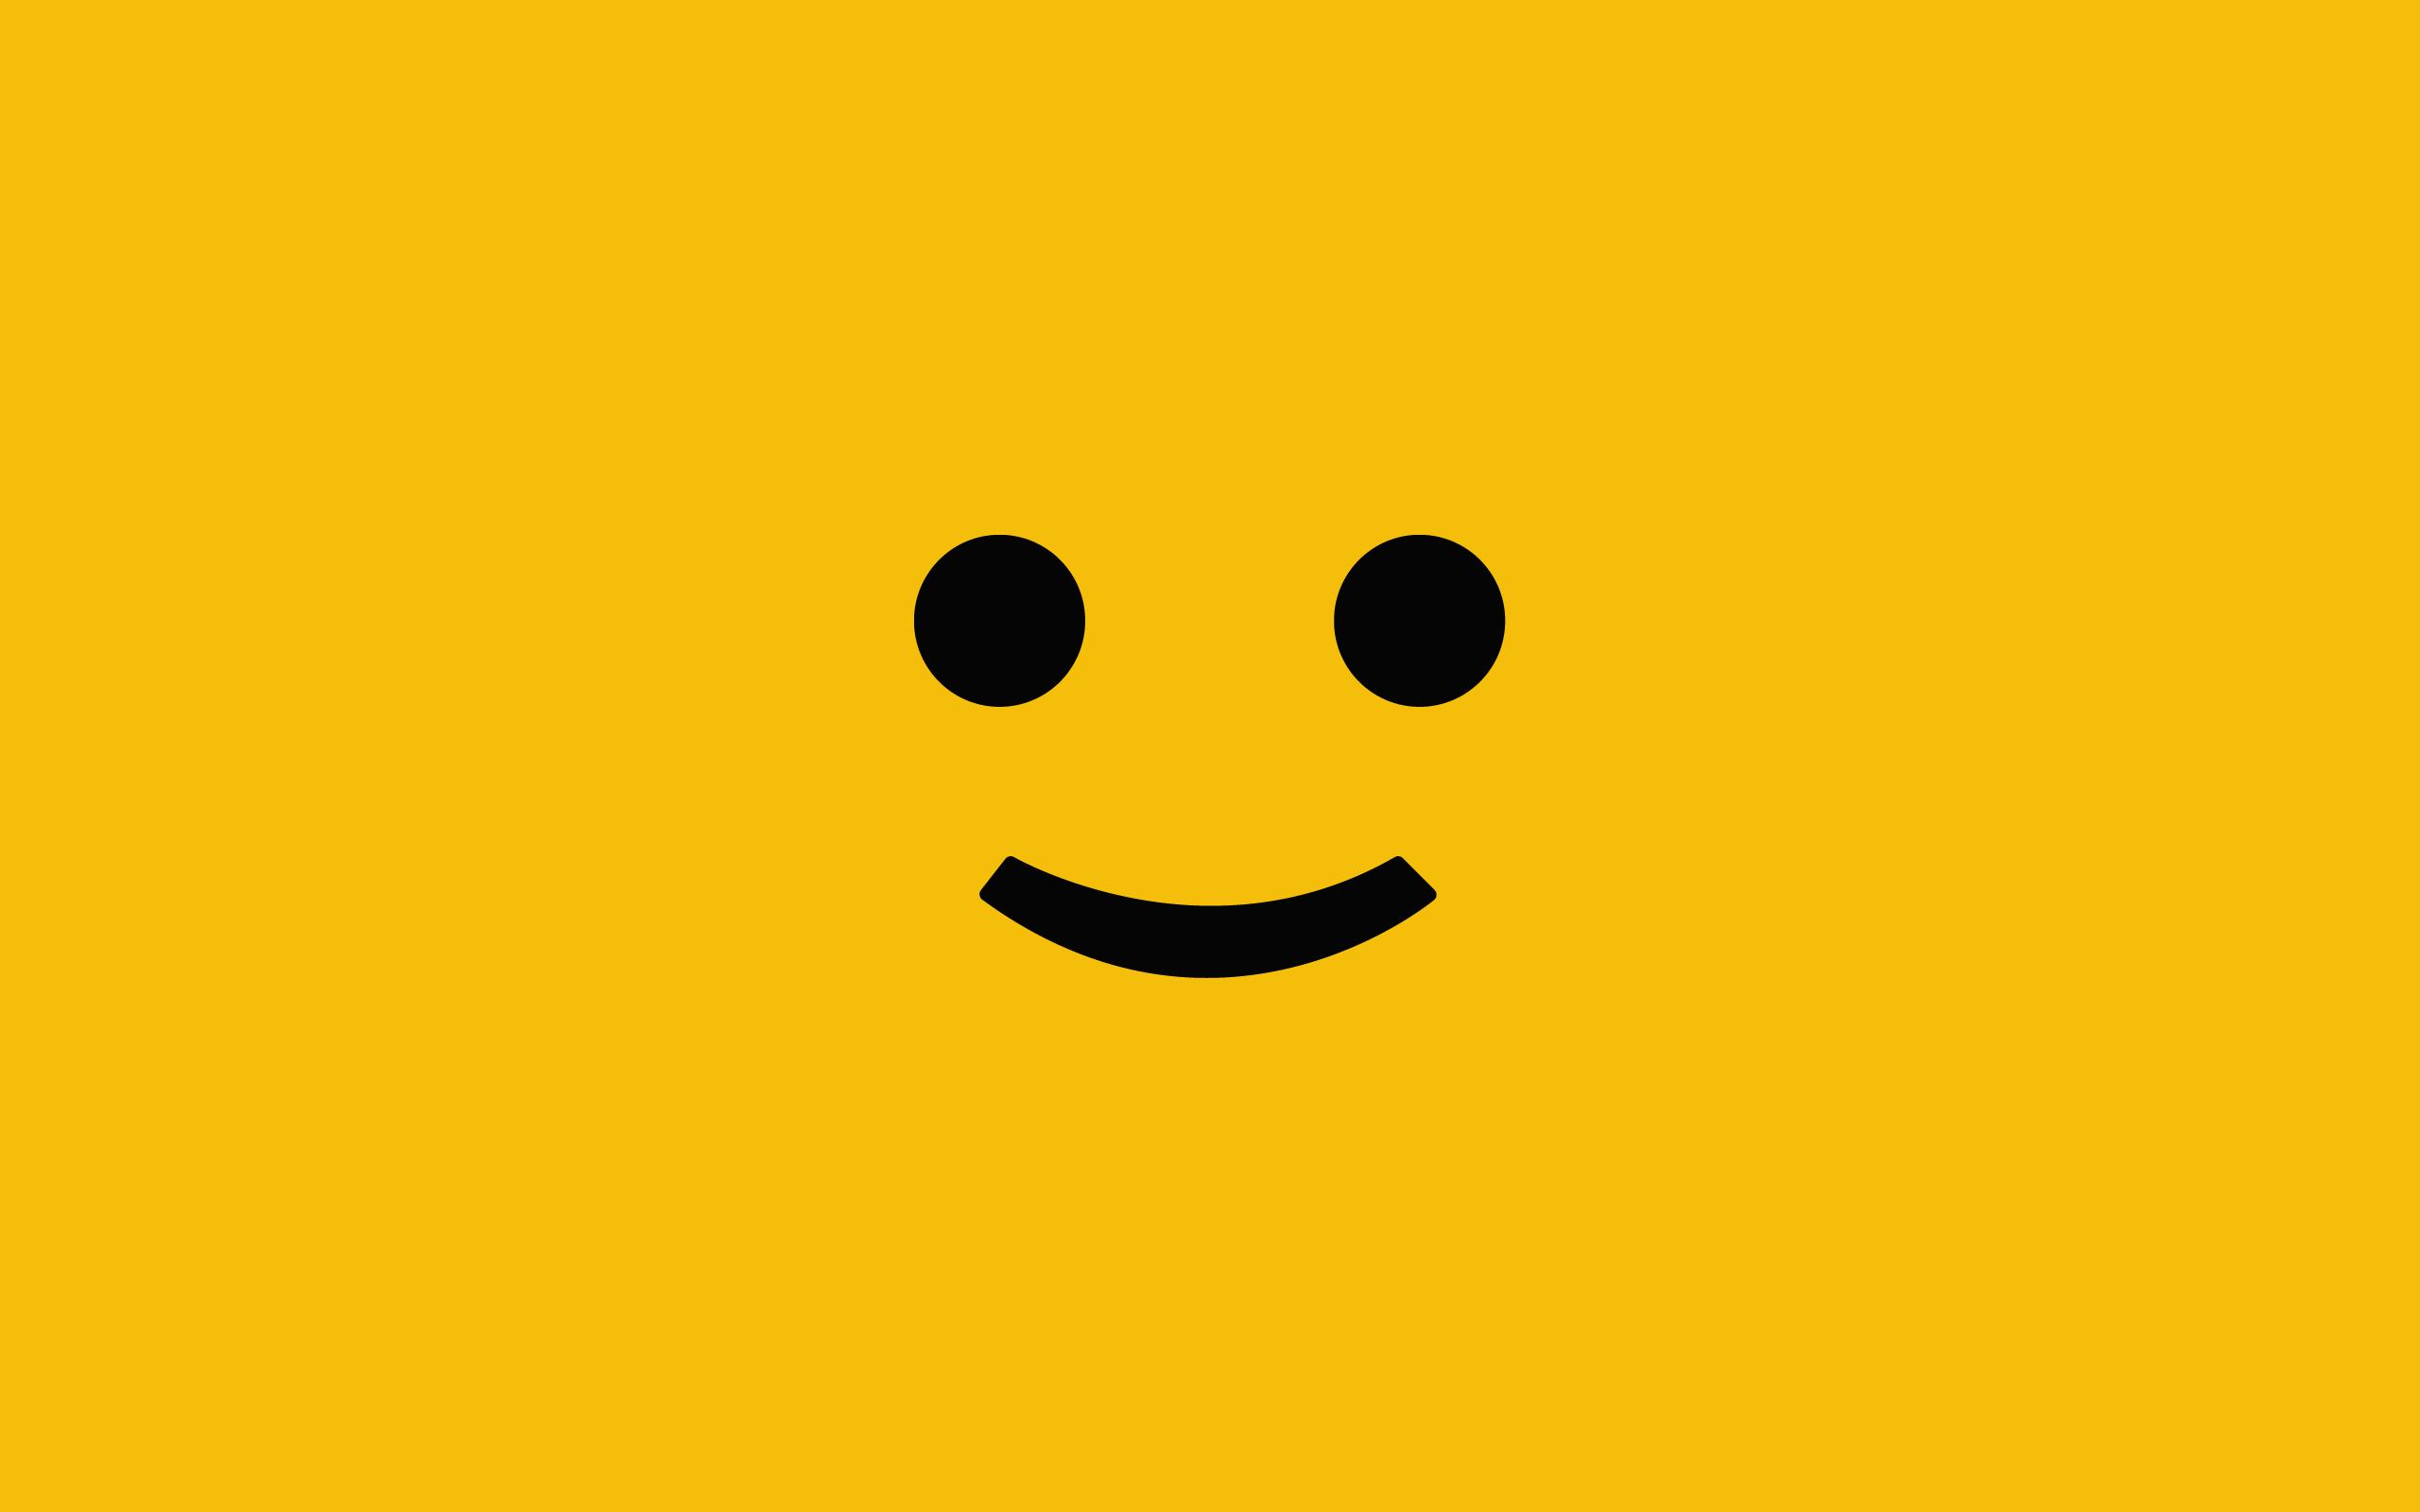 Wall4All Legos minimalistic yellow background desktop